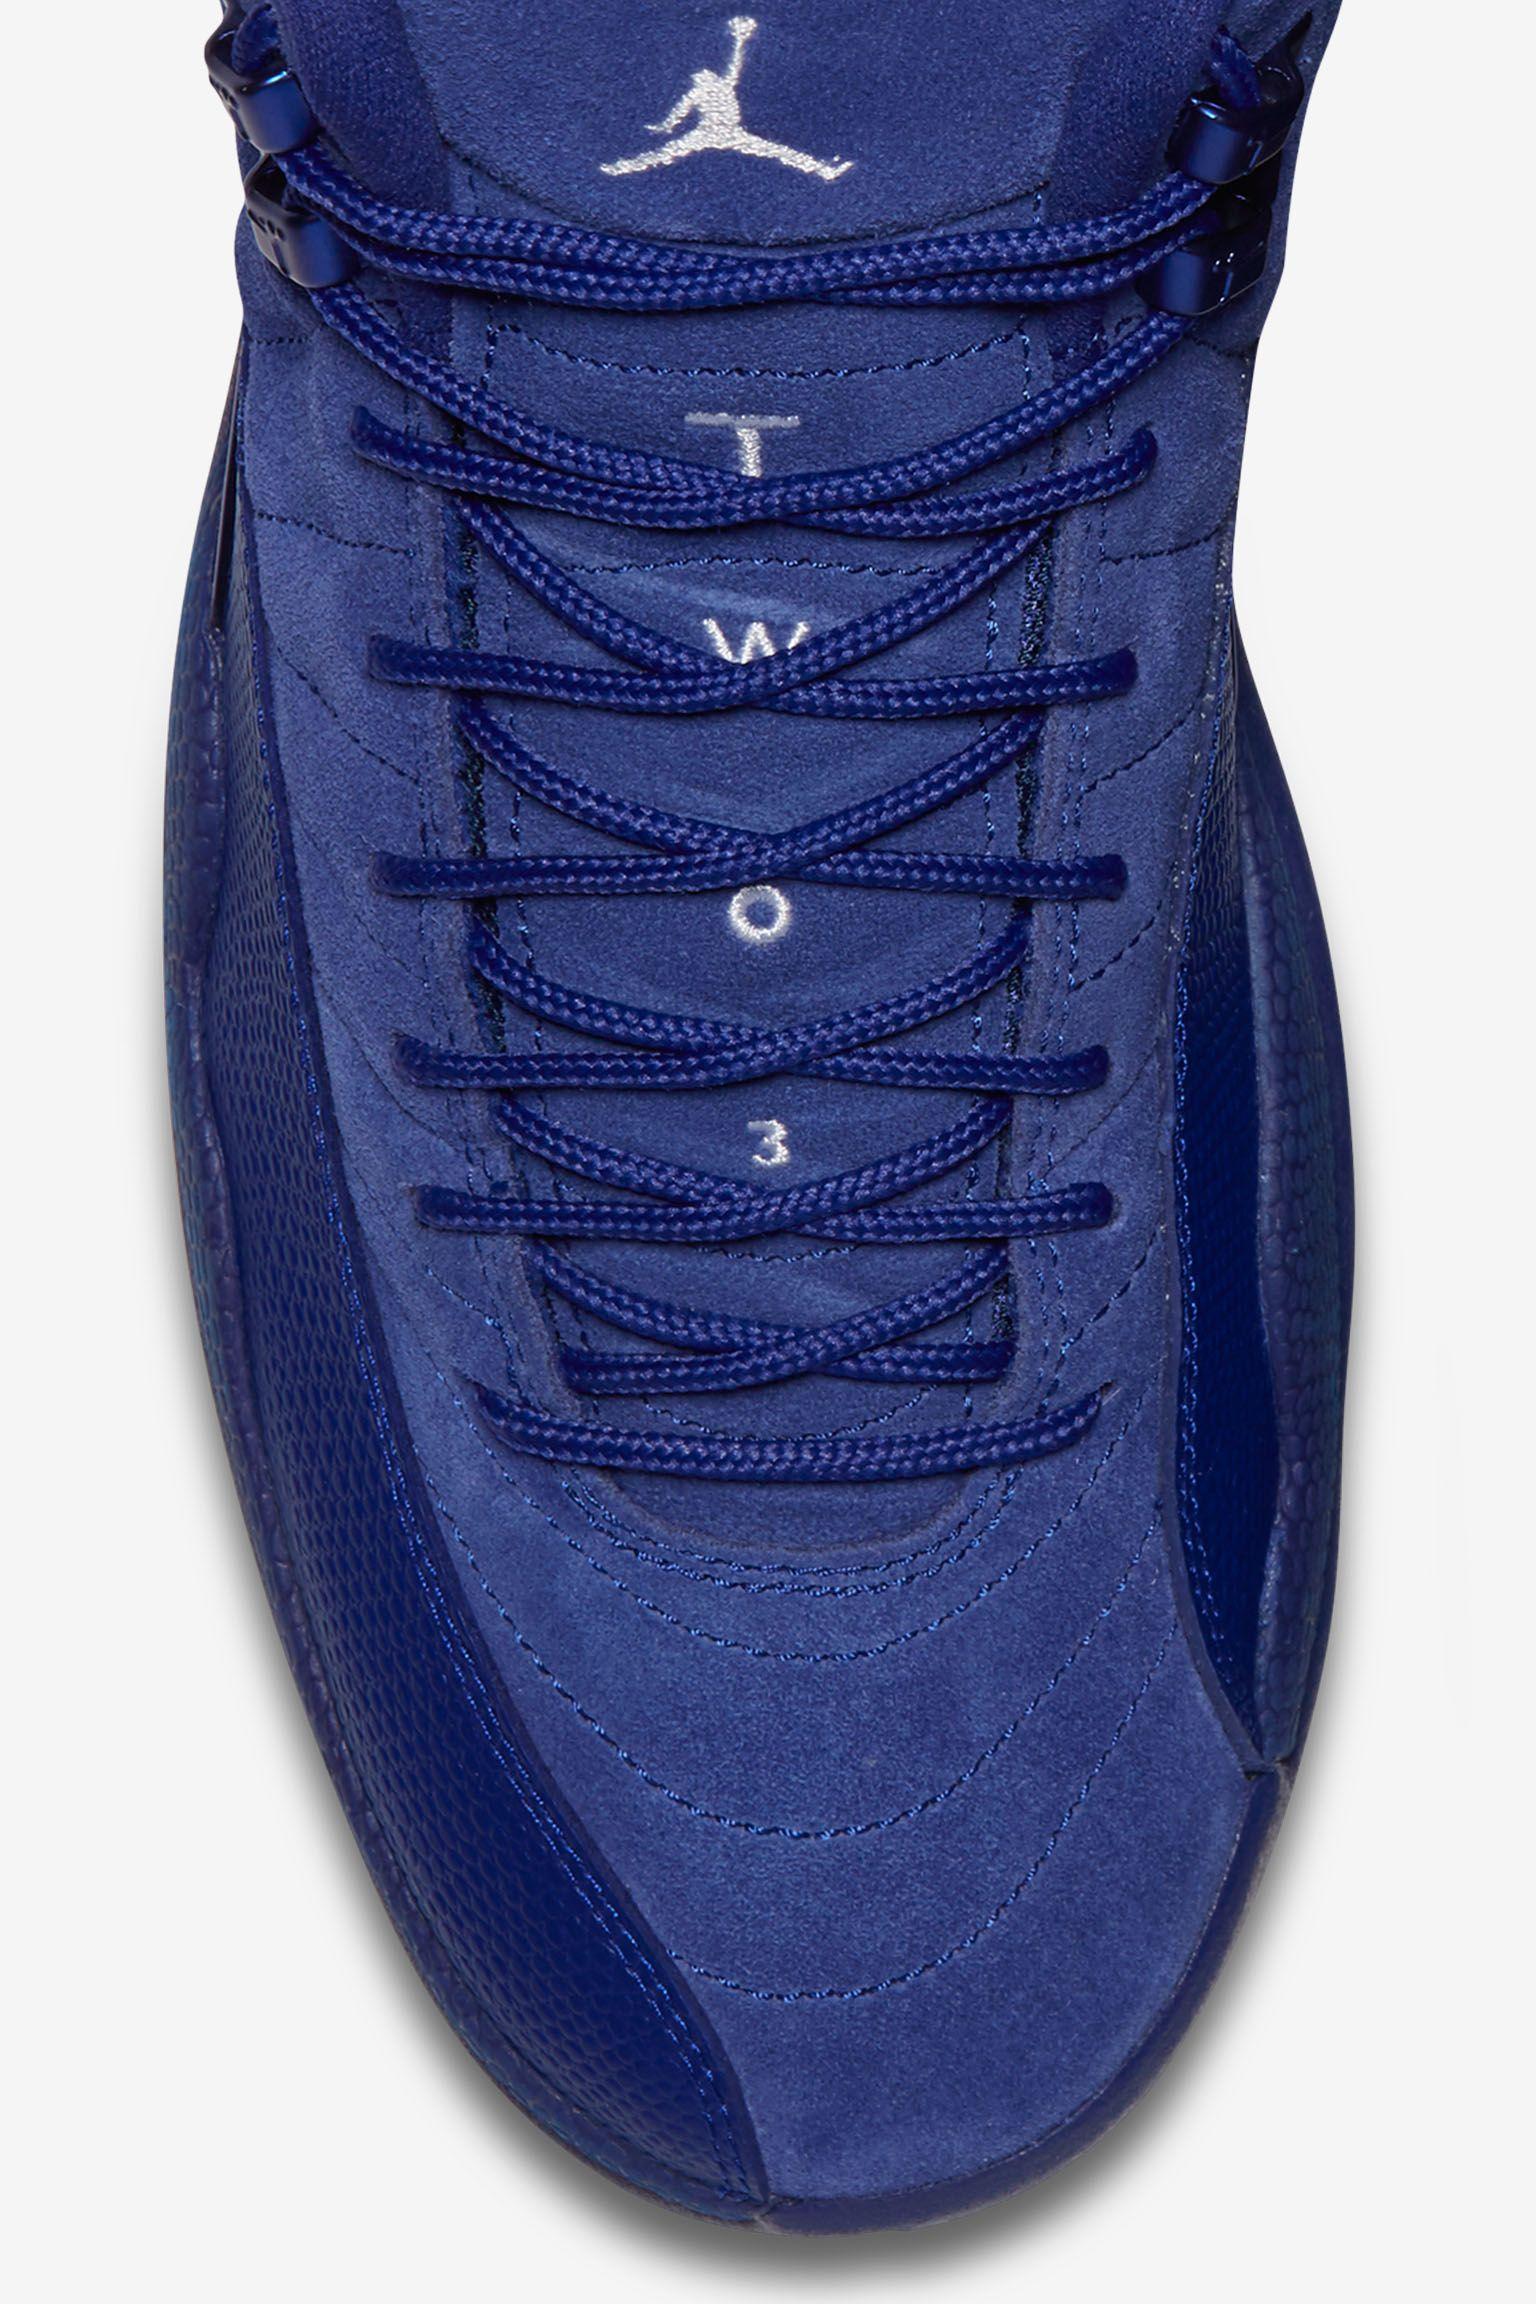 Air Jordan 12 Retro 'Deep Royal Blue'. Release Date